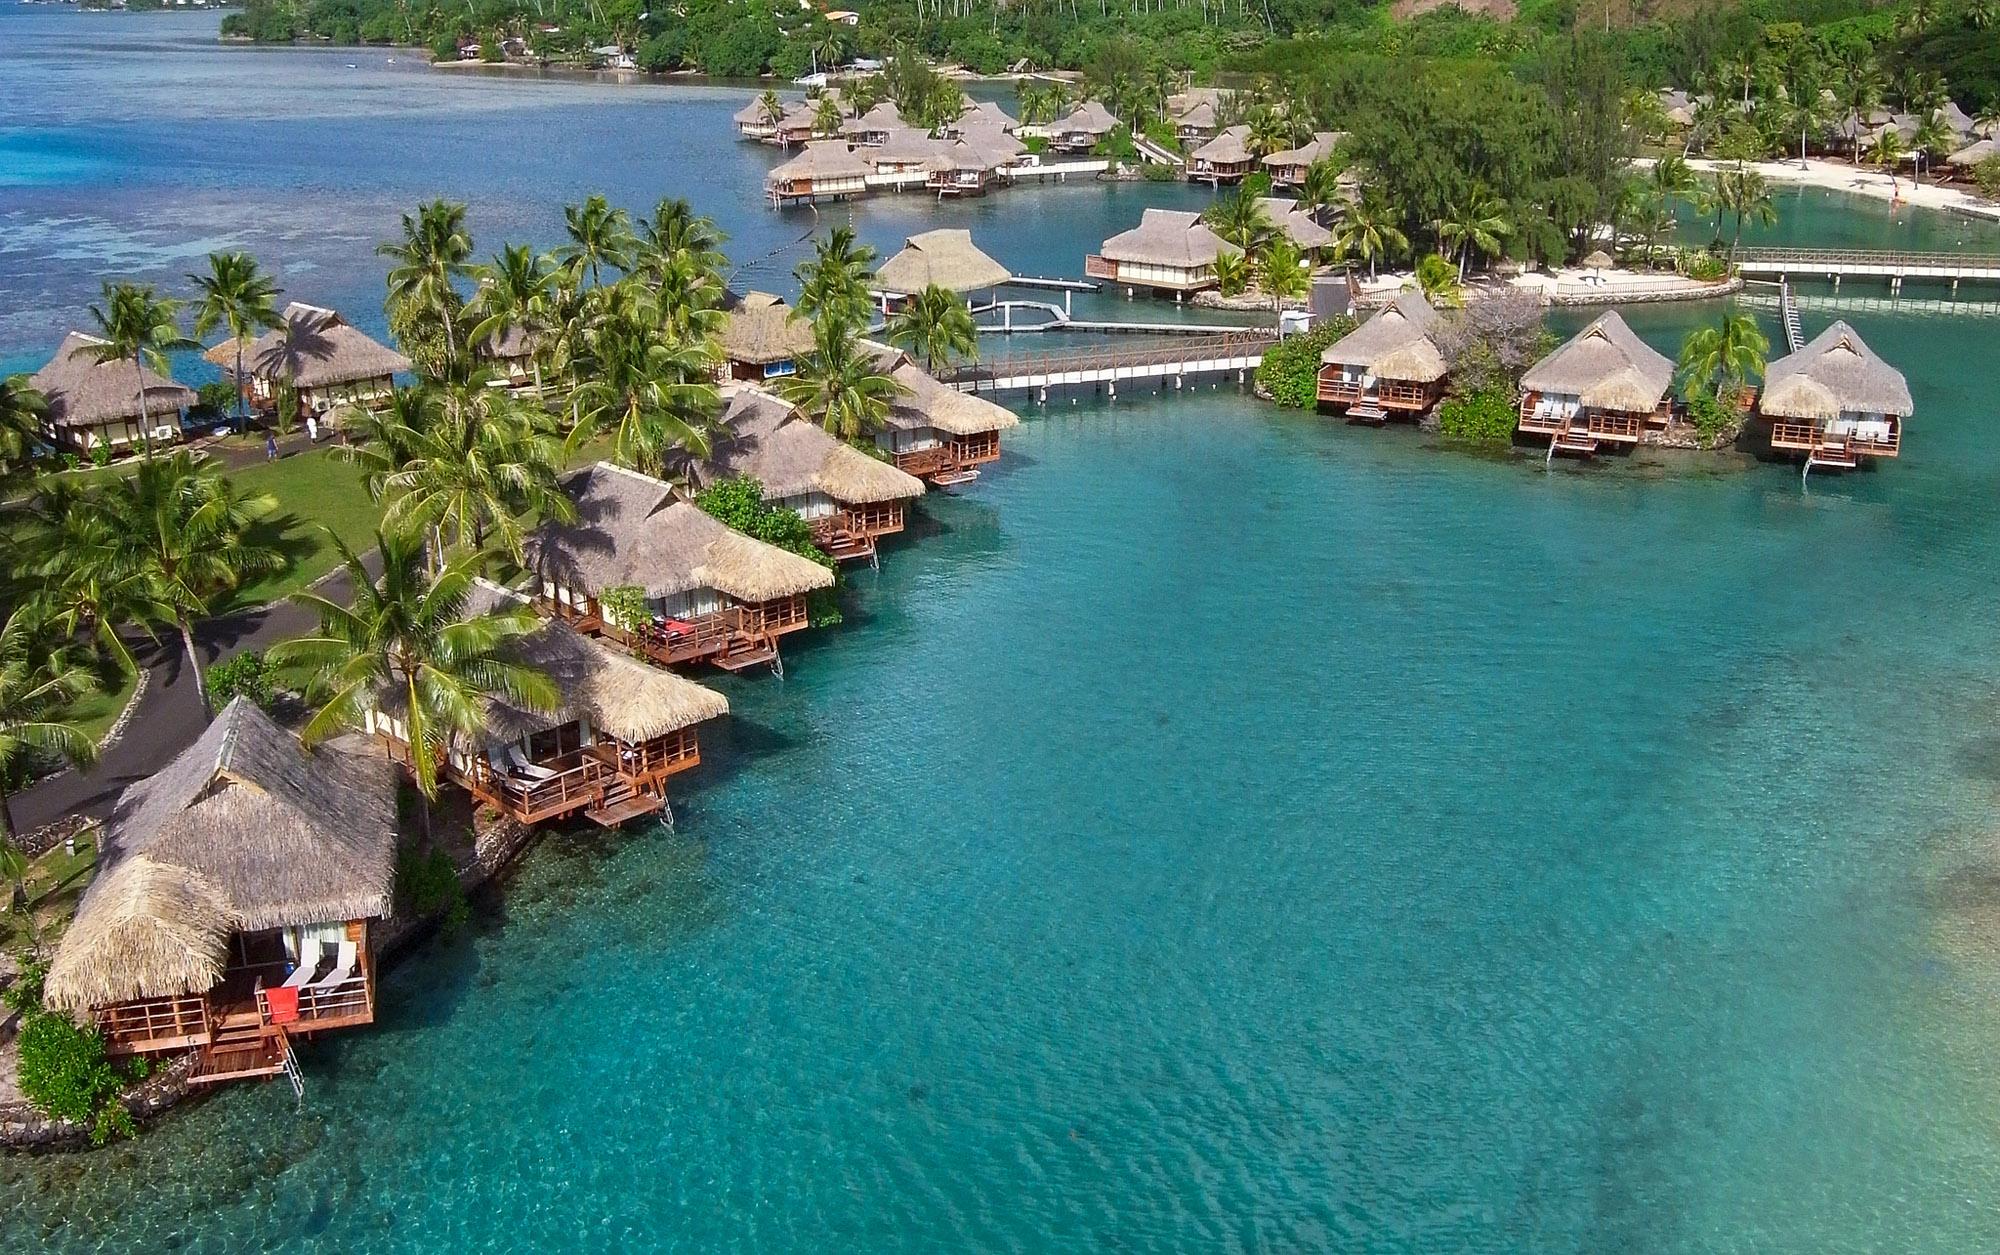 https://tahititourisme.de/wp-content/uploads/2019/04/v-islands-marketing_7044360041_IC-MOOREA-Overwater-bungalow2.jpg